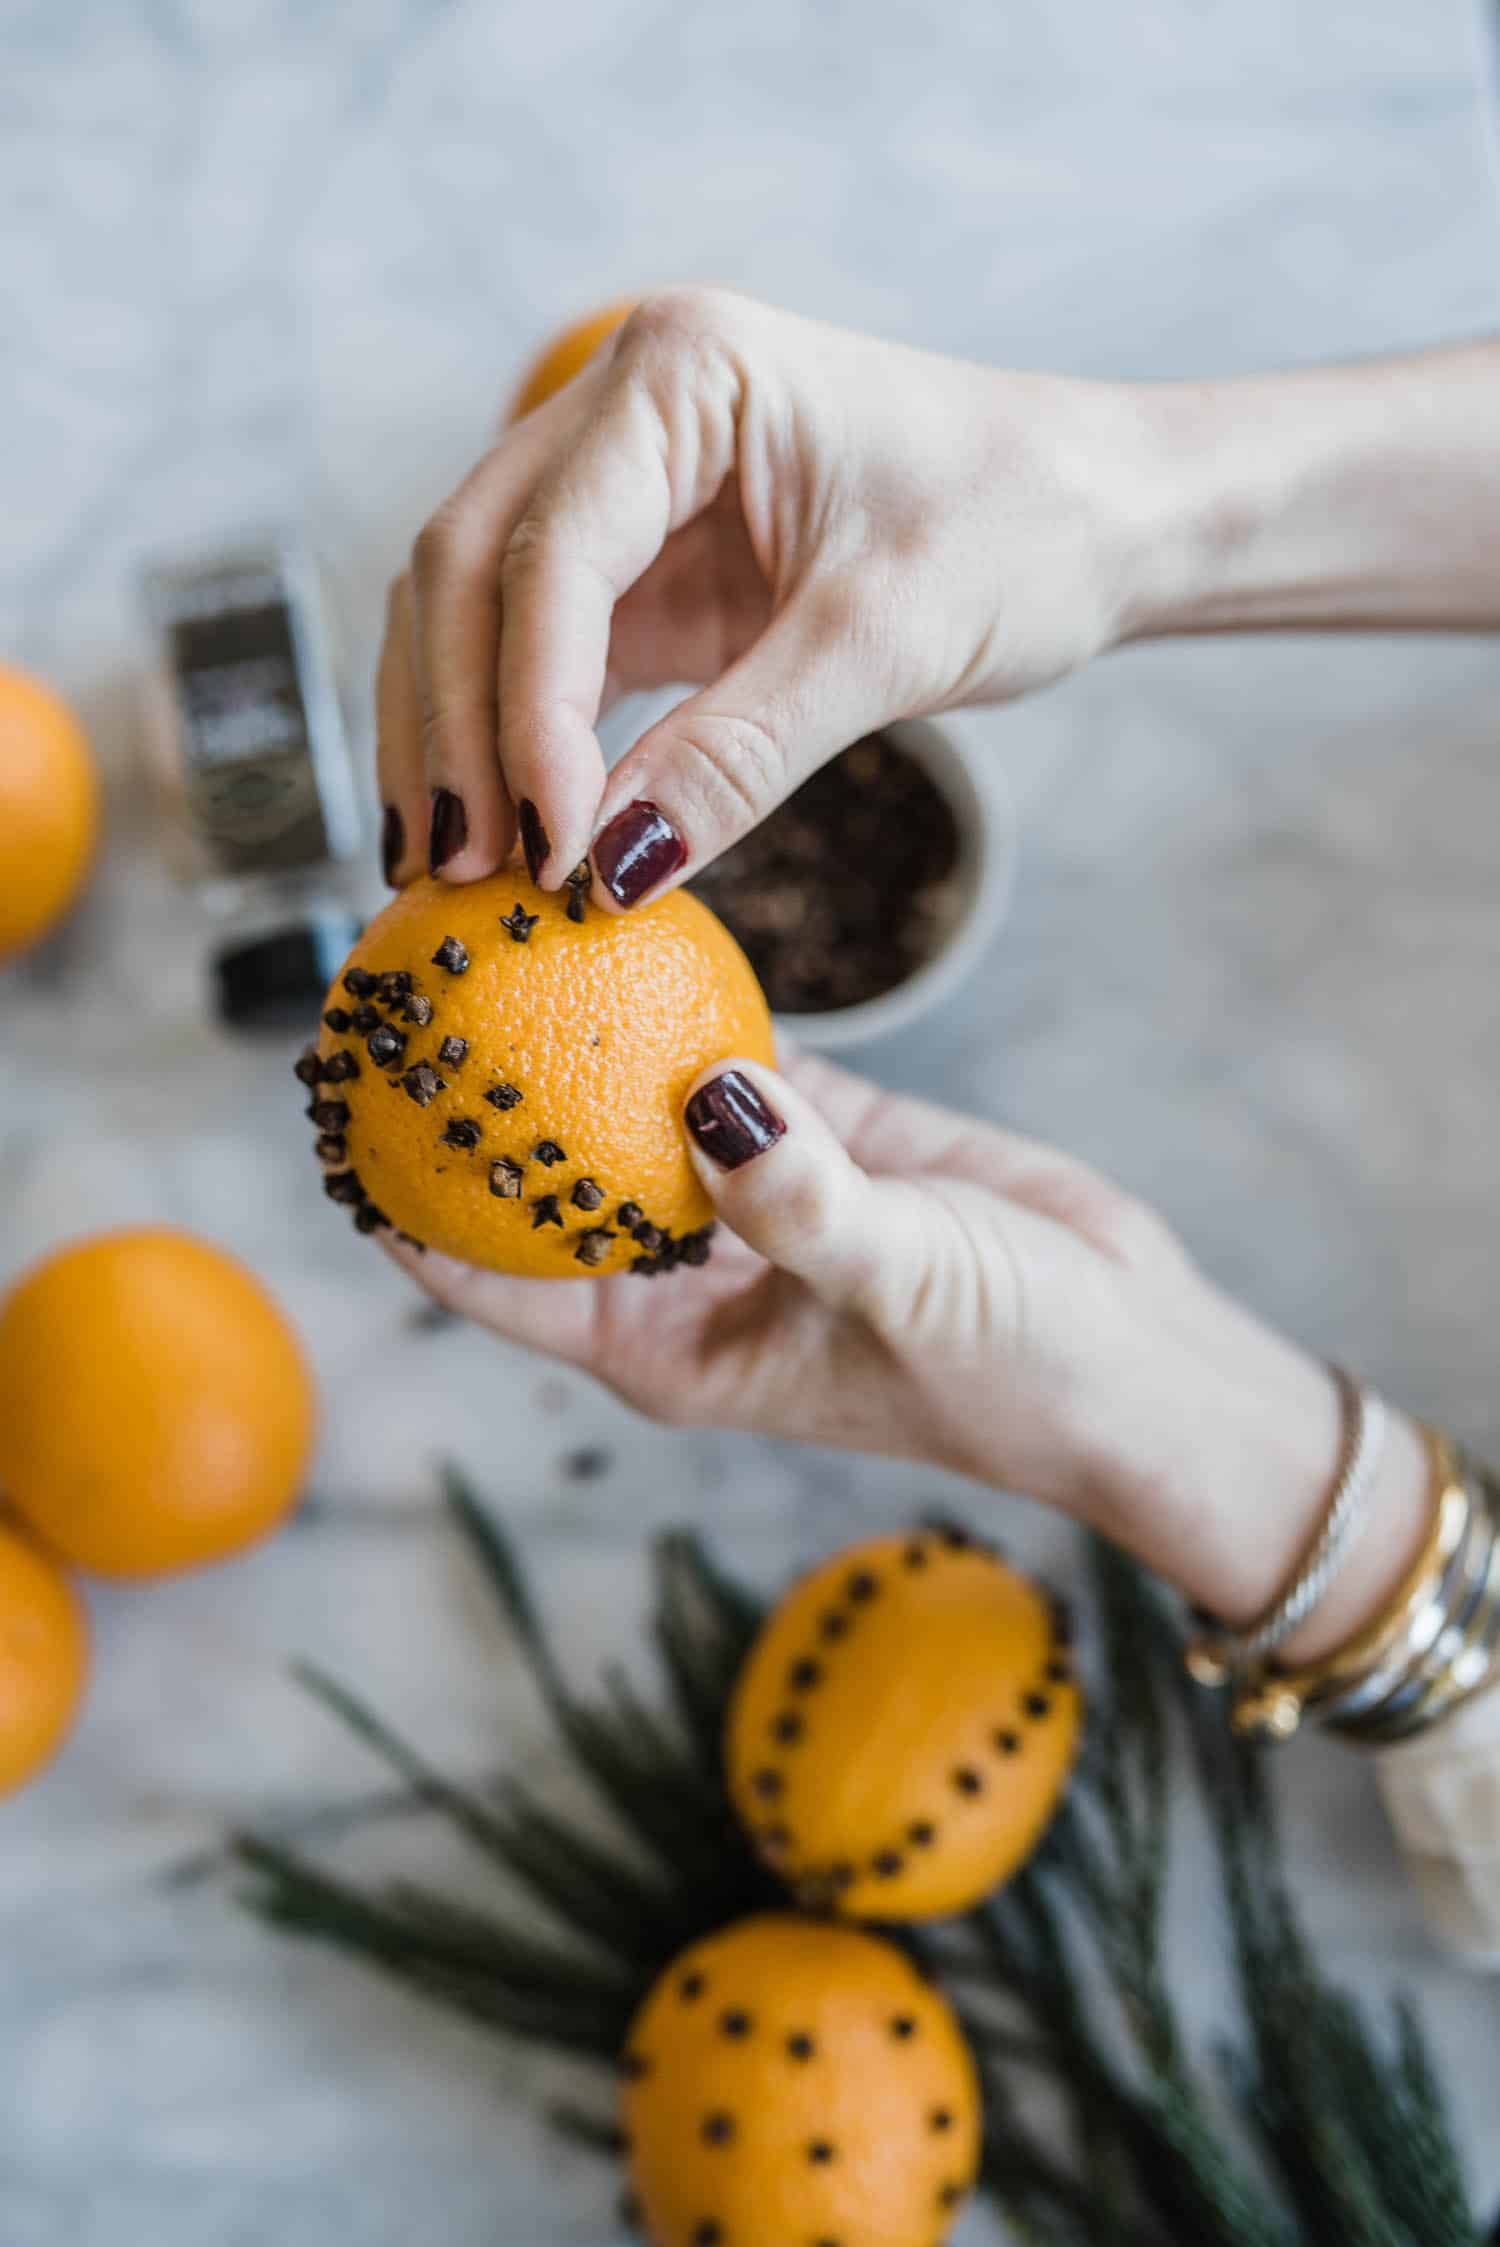 DIY Orange Pomander Balls - #holiday #holidaydiy spiced orange pomander balls @mystylevita